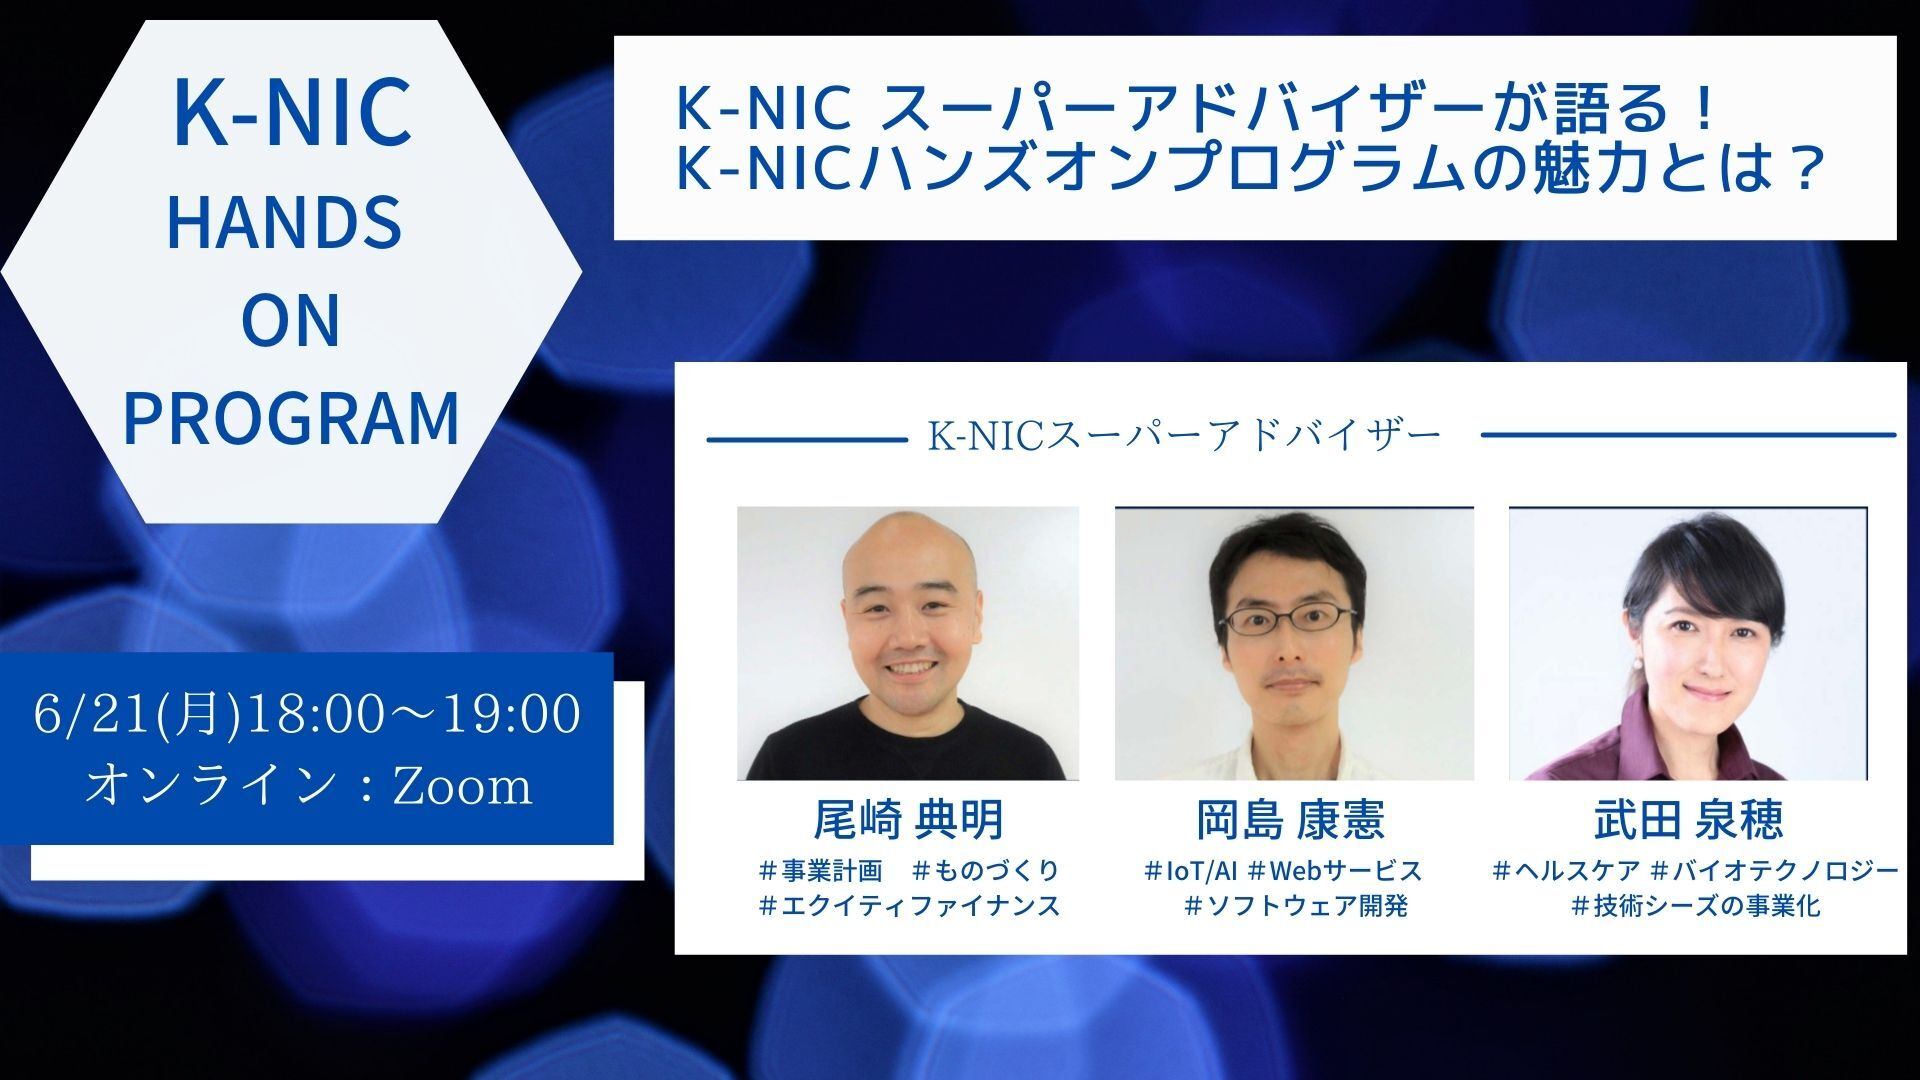 K-NICスーパーバイザーが語る!K-NICハンズオンプログラムの魅力とは?